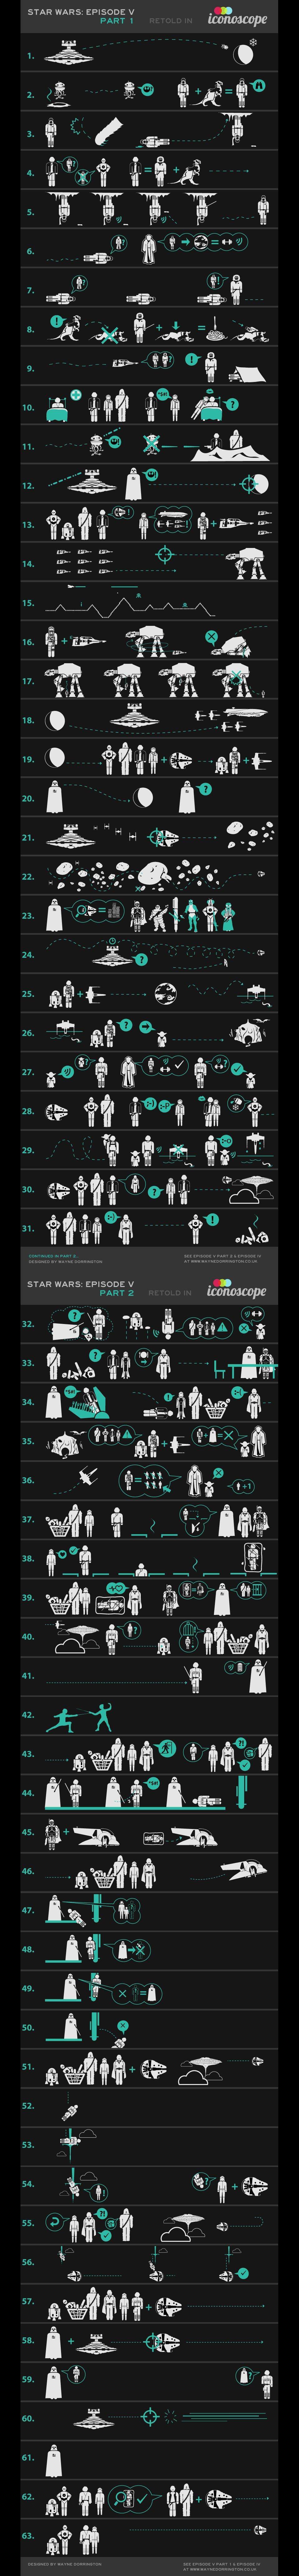 The Empire Strikes Back Retold in Iconoscope